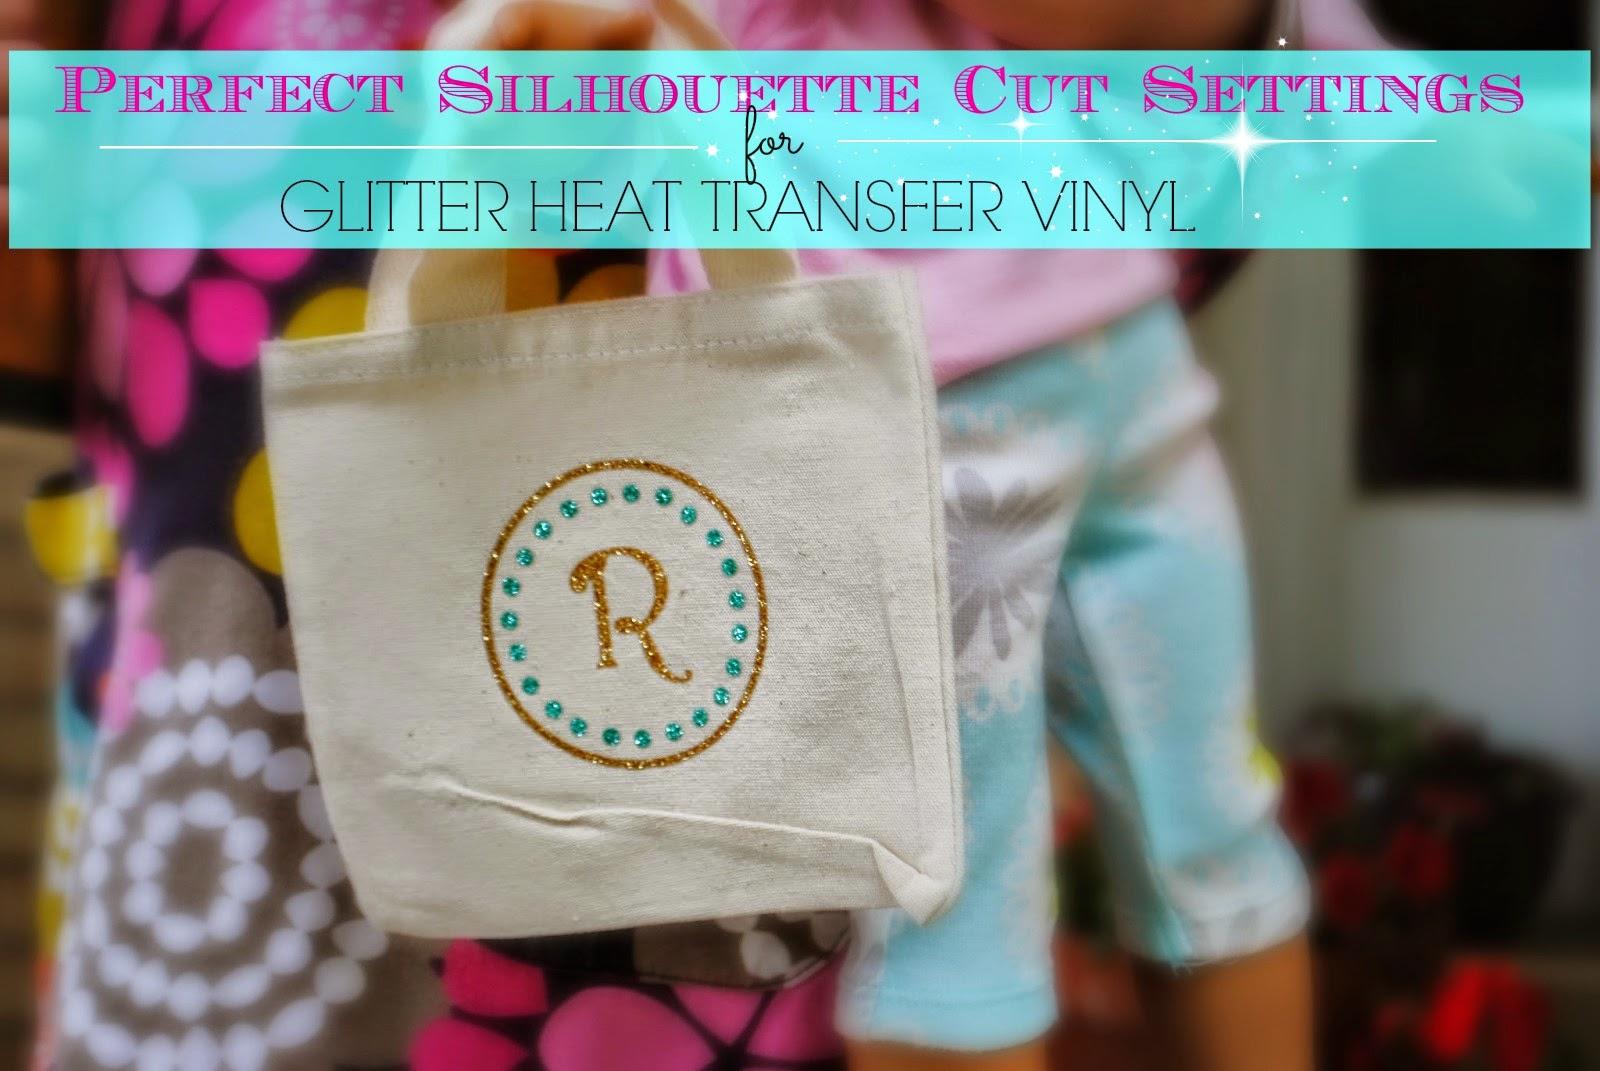 Silhouette Cameo, glitter HTV, glitter heat transfer vinyl, cut settings